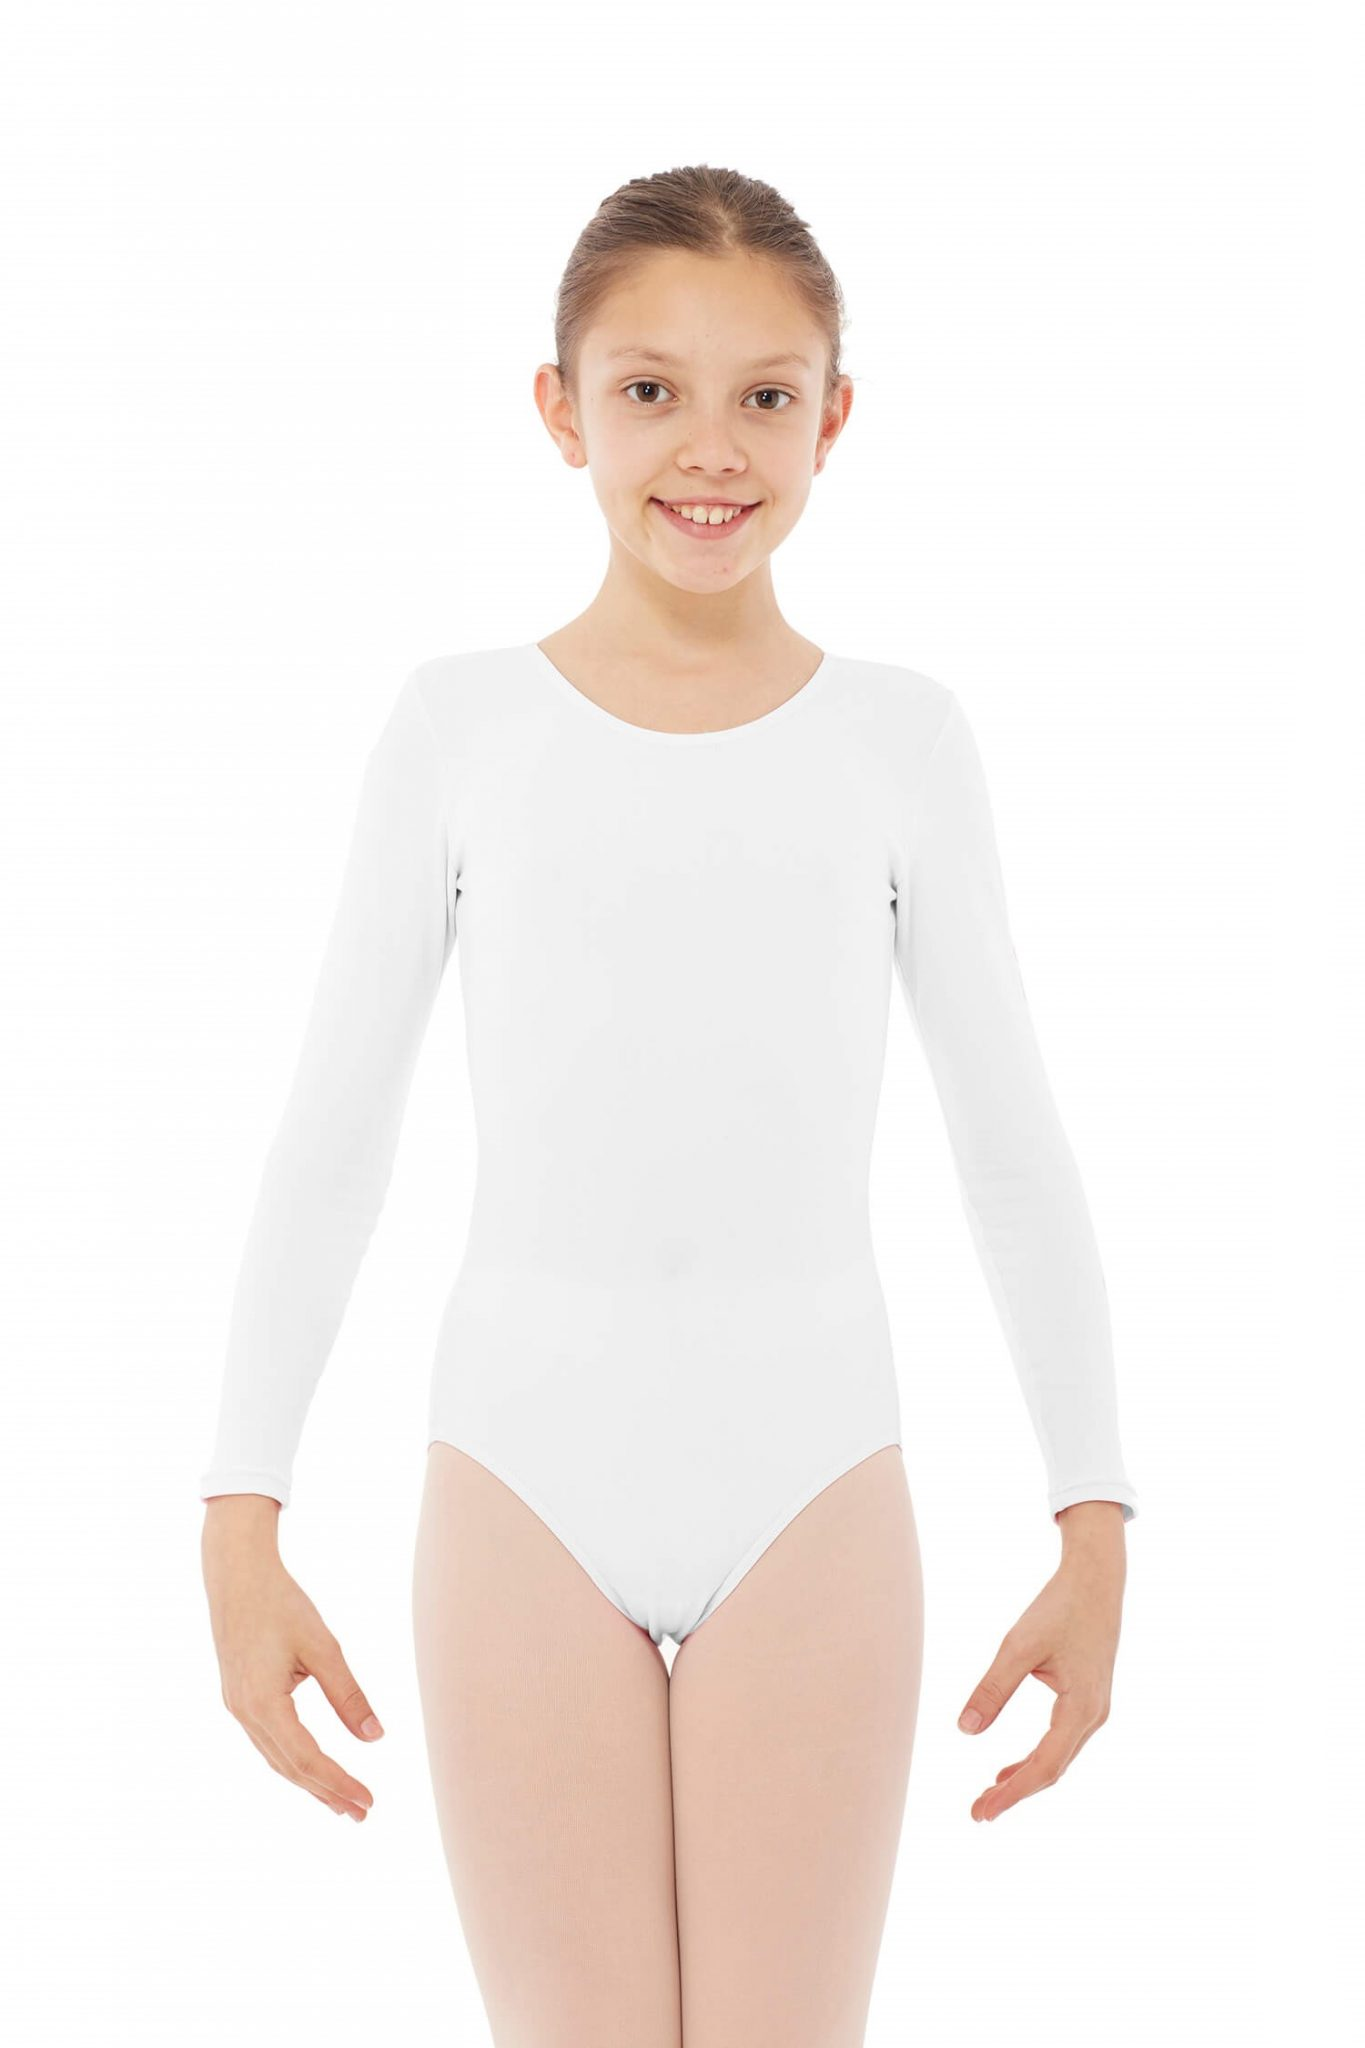 Maillot de baile manga larga blanco 3010 Bl